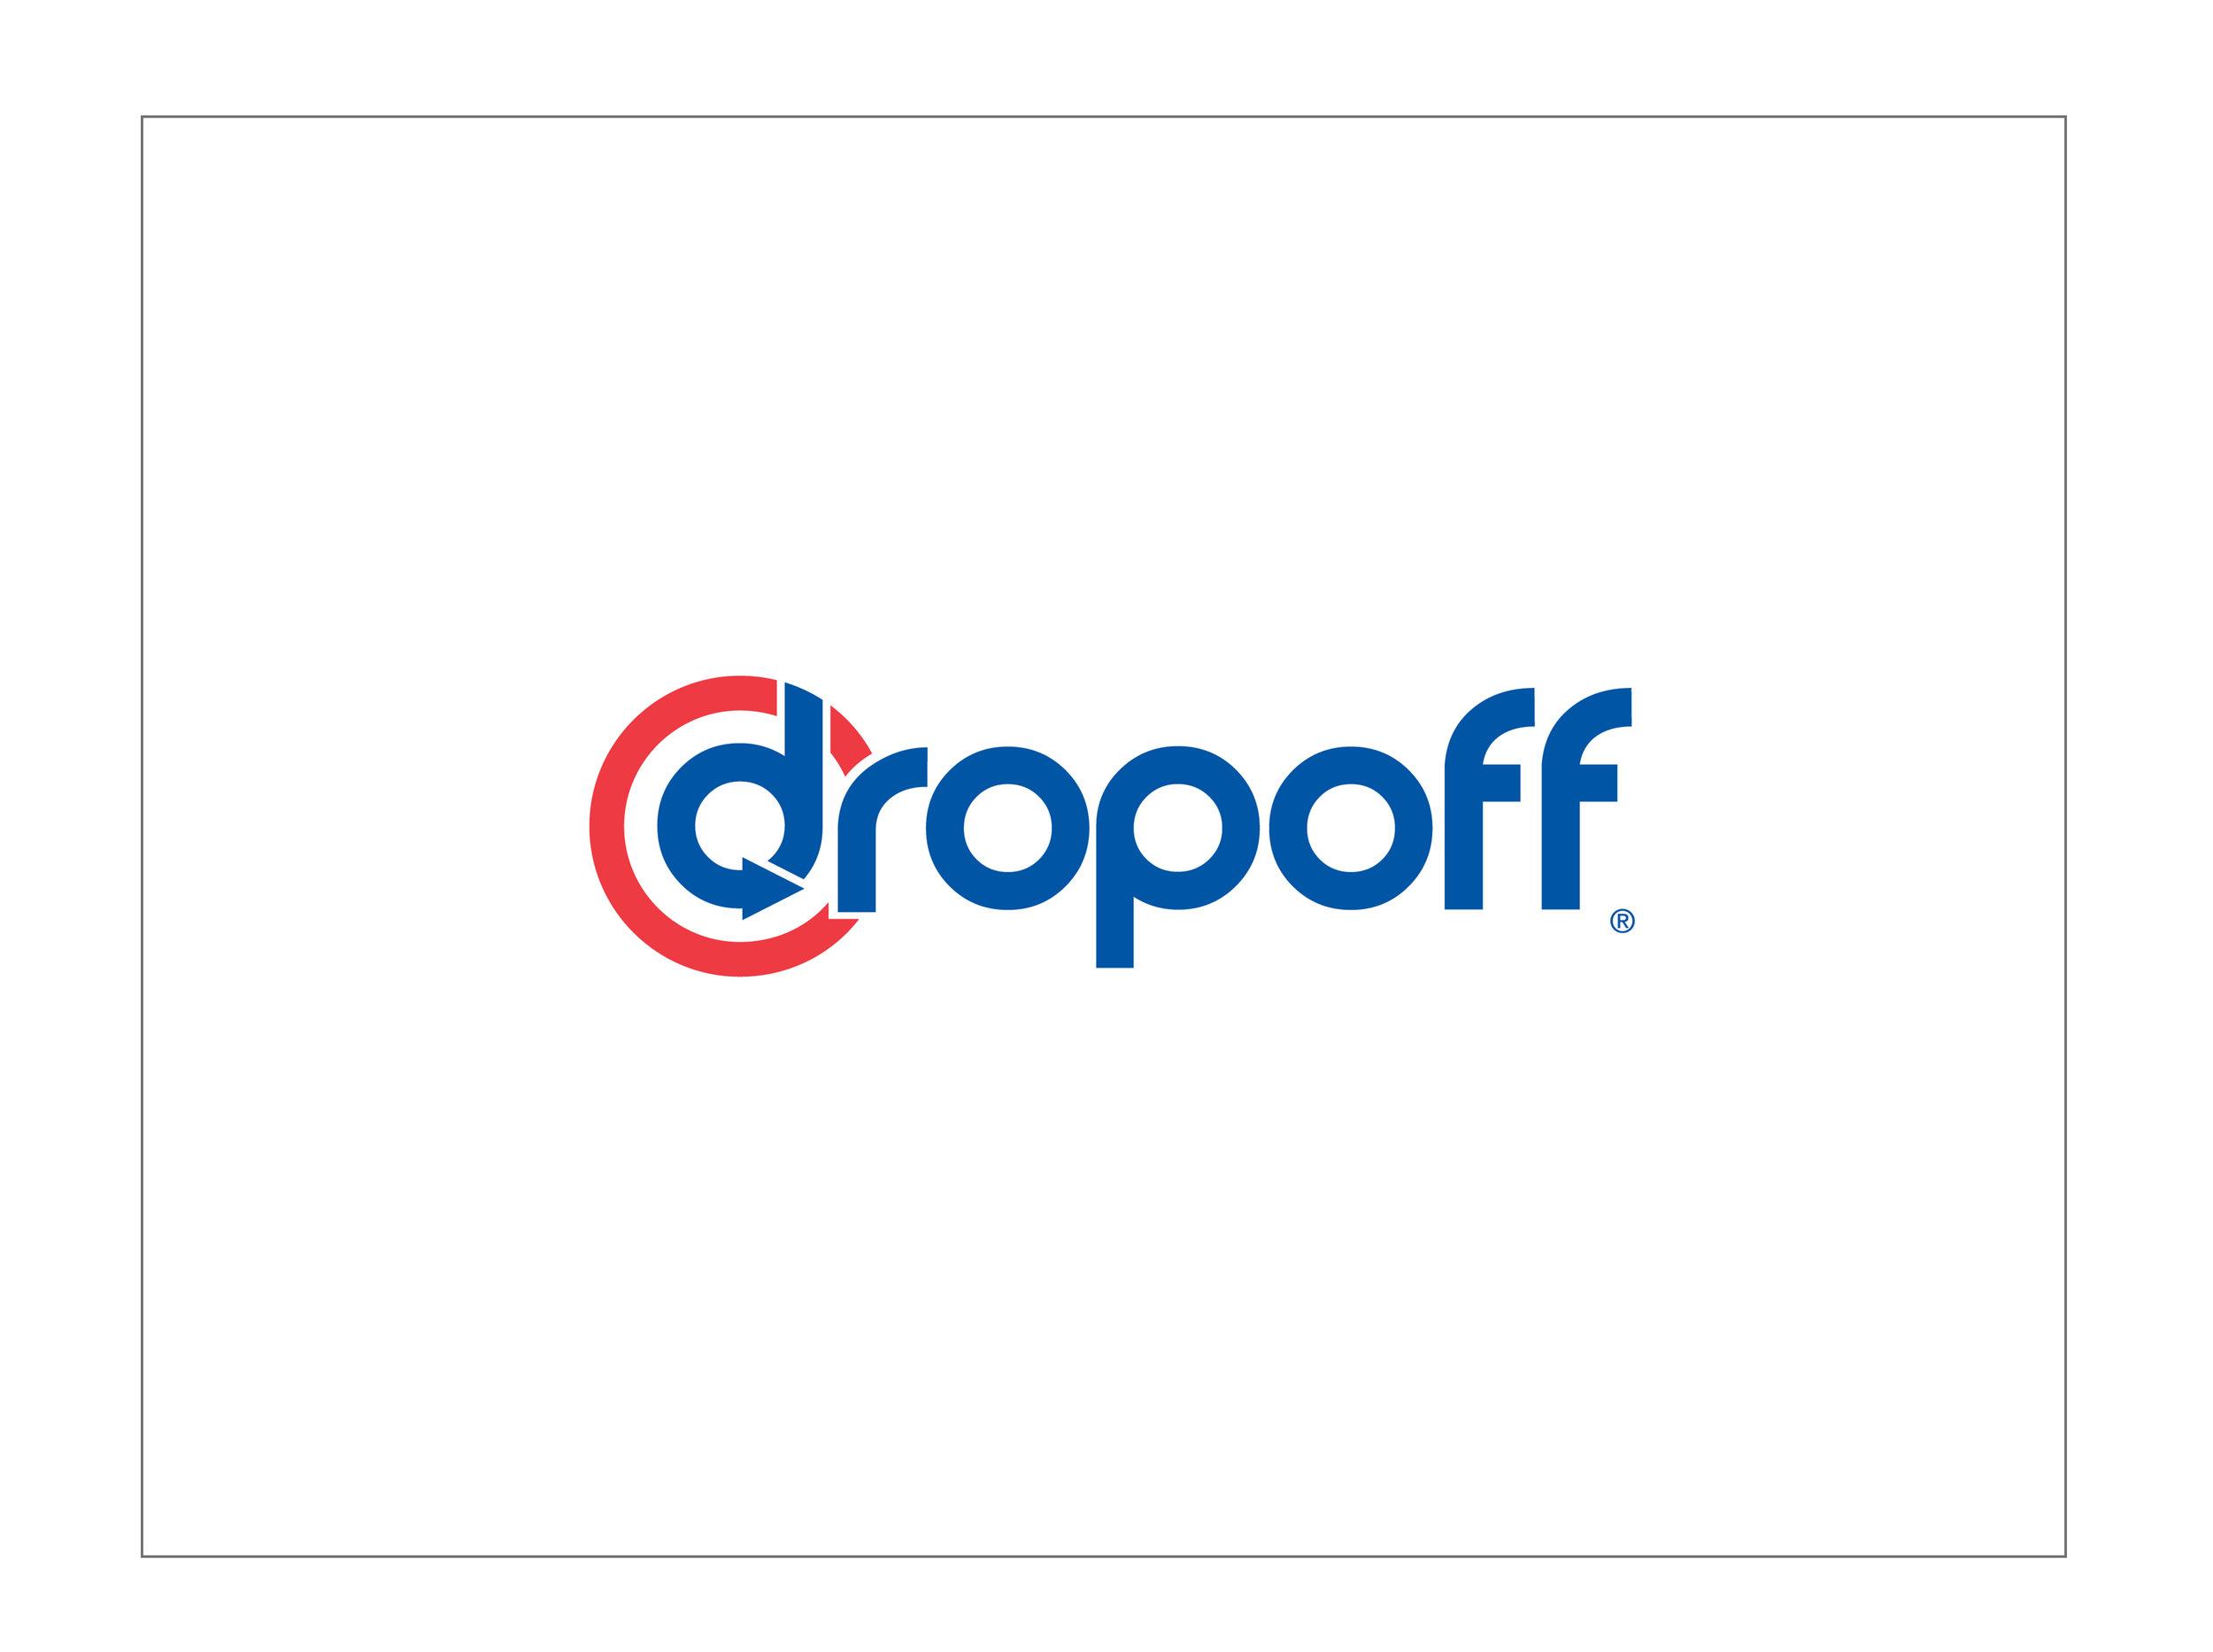 dropoff.jpg